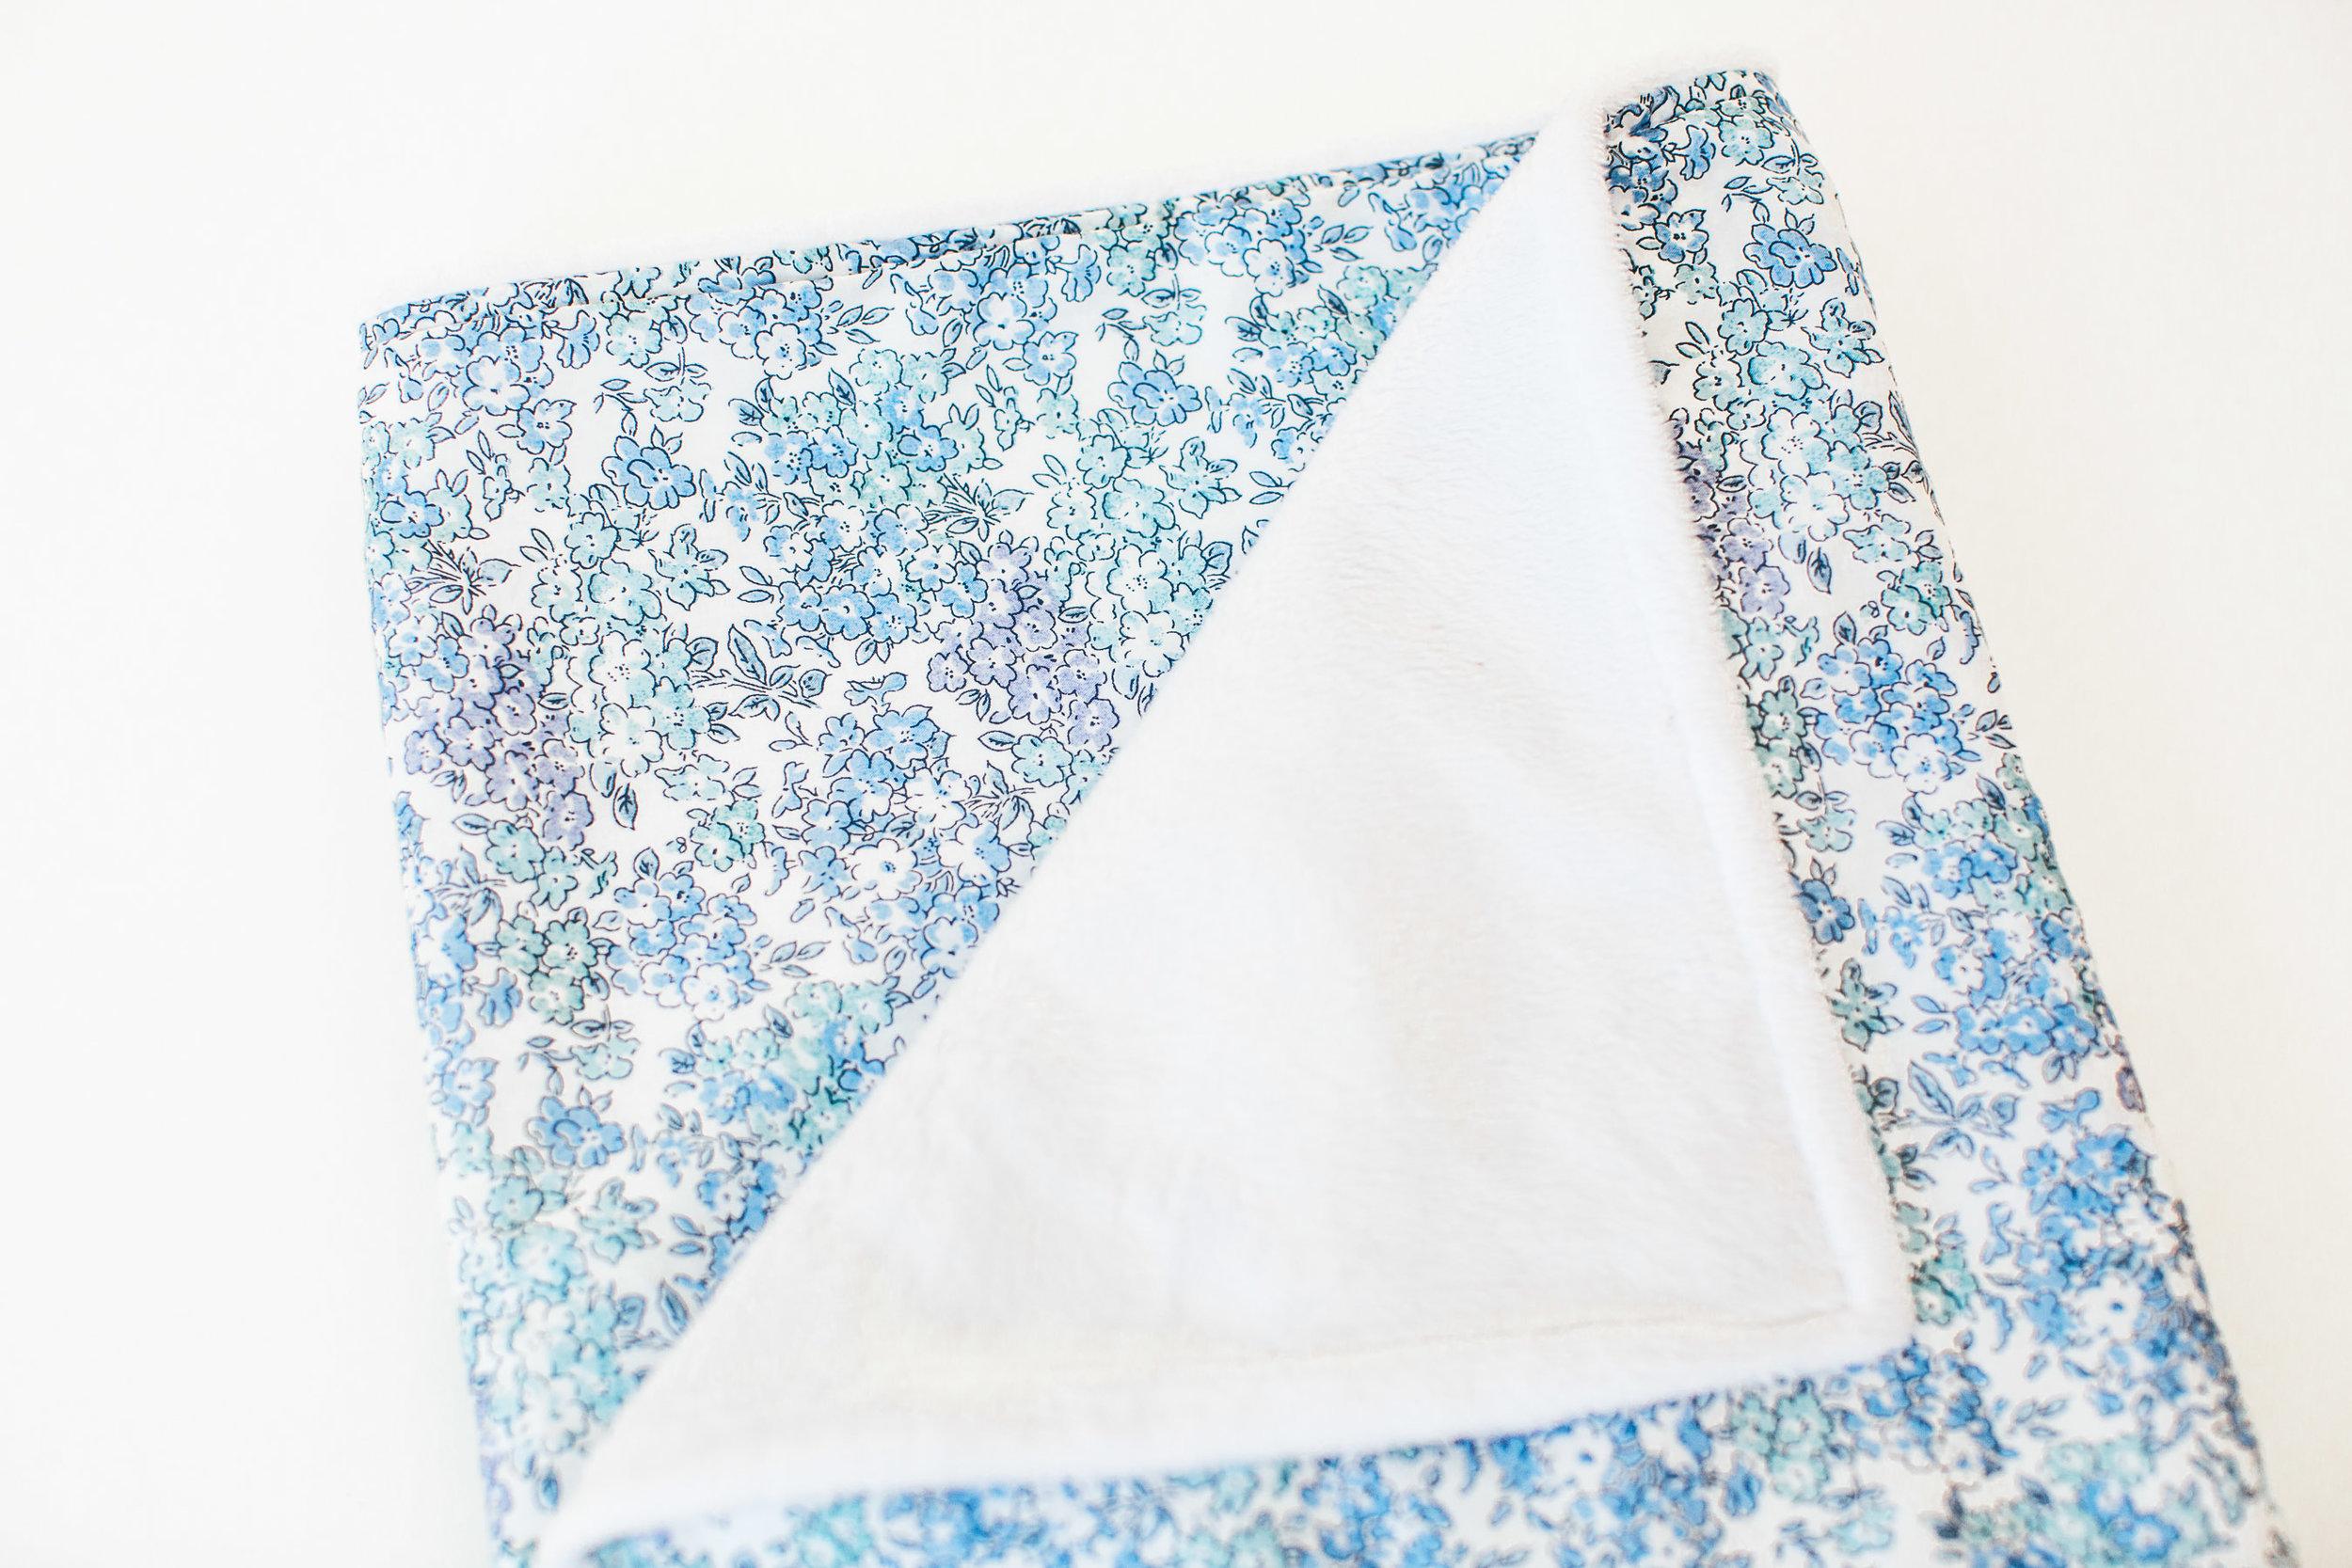 Liberty Print Baby Blanket - Tom  30 GBP